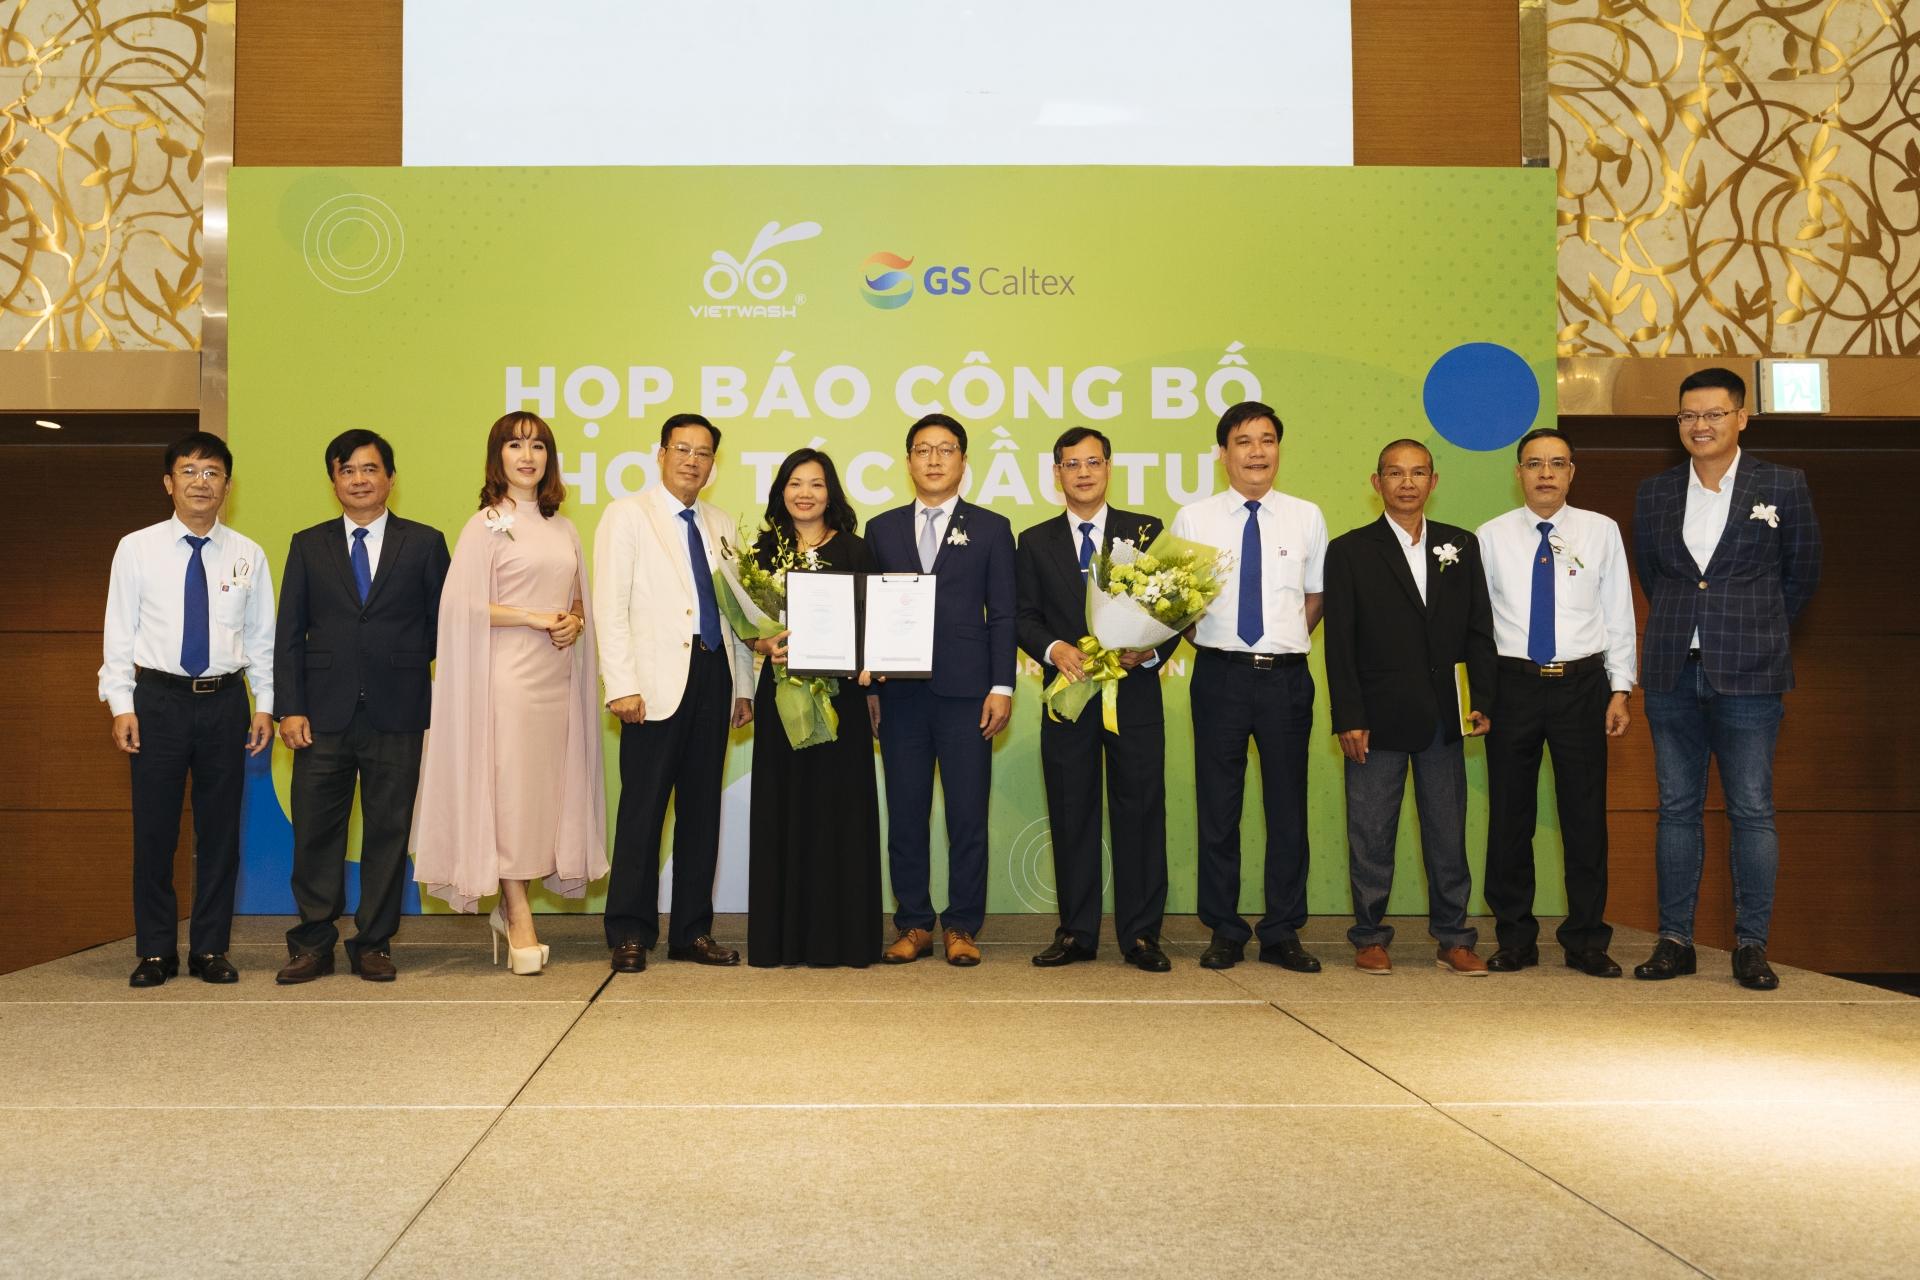 South Korea's GS Caltex pours $1.7 million into car wash chain operator Vietwash